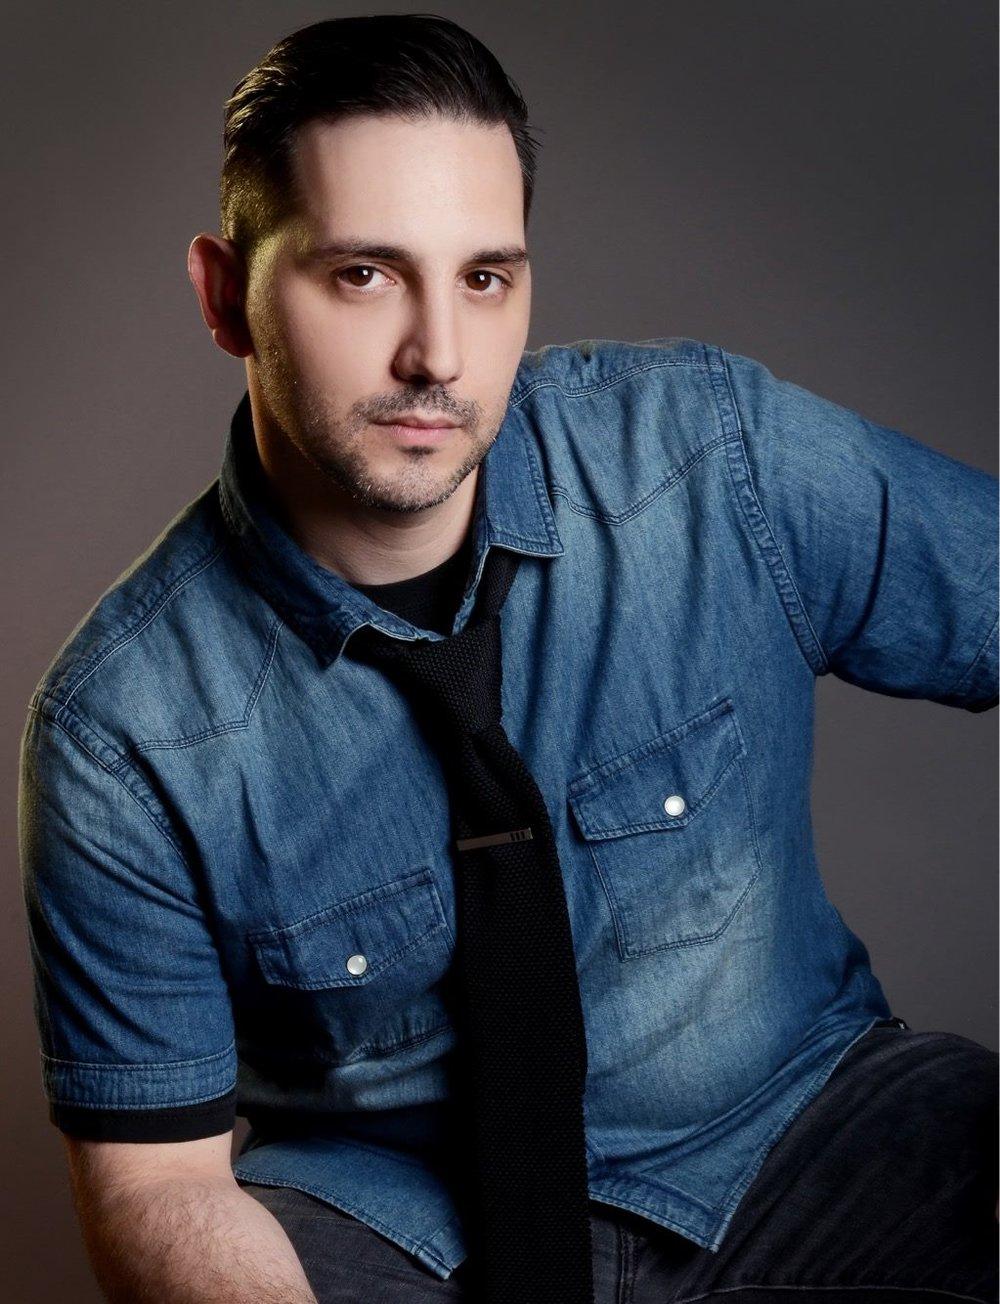 Nick Dinicolangelo